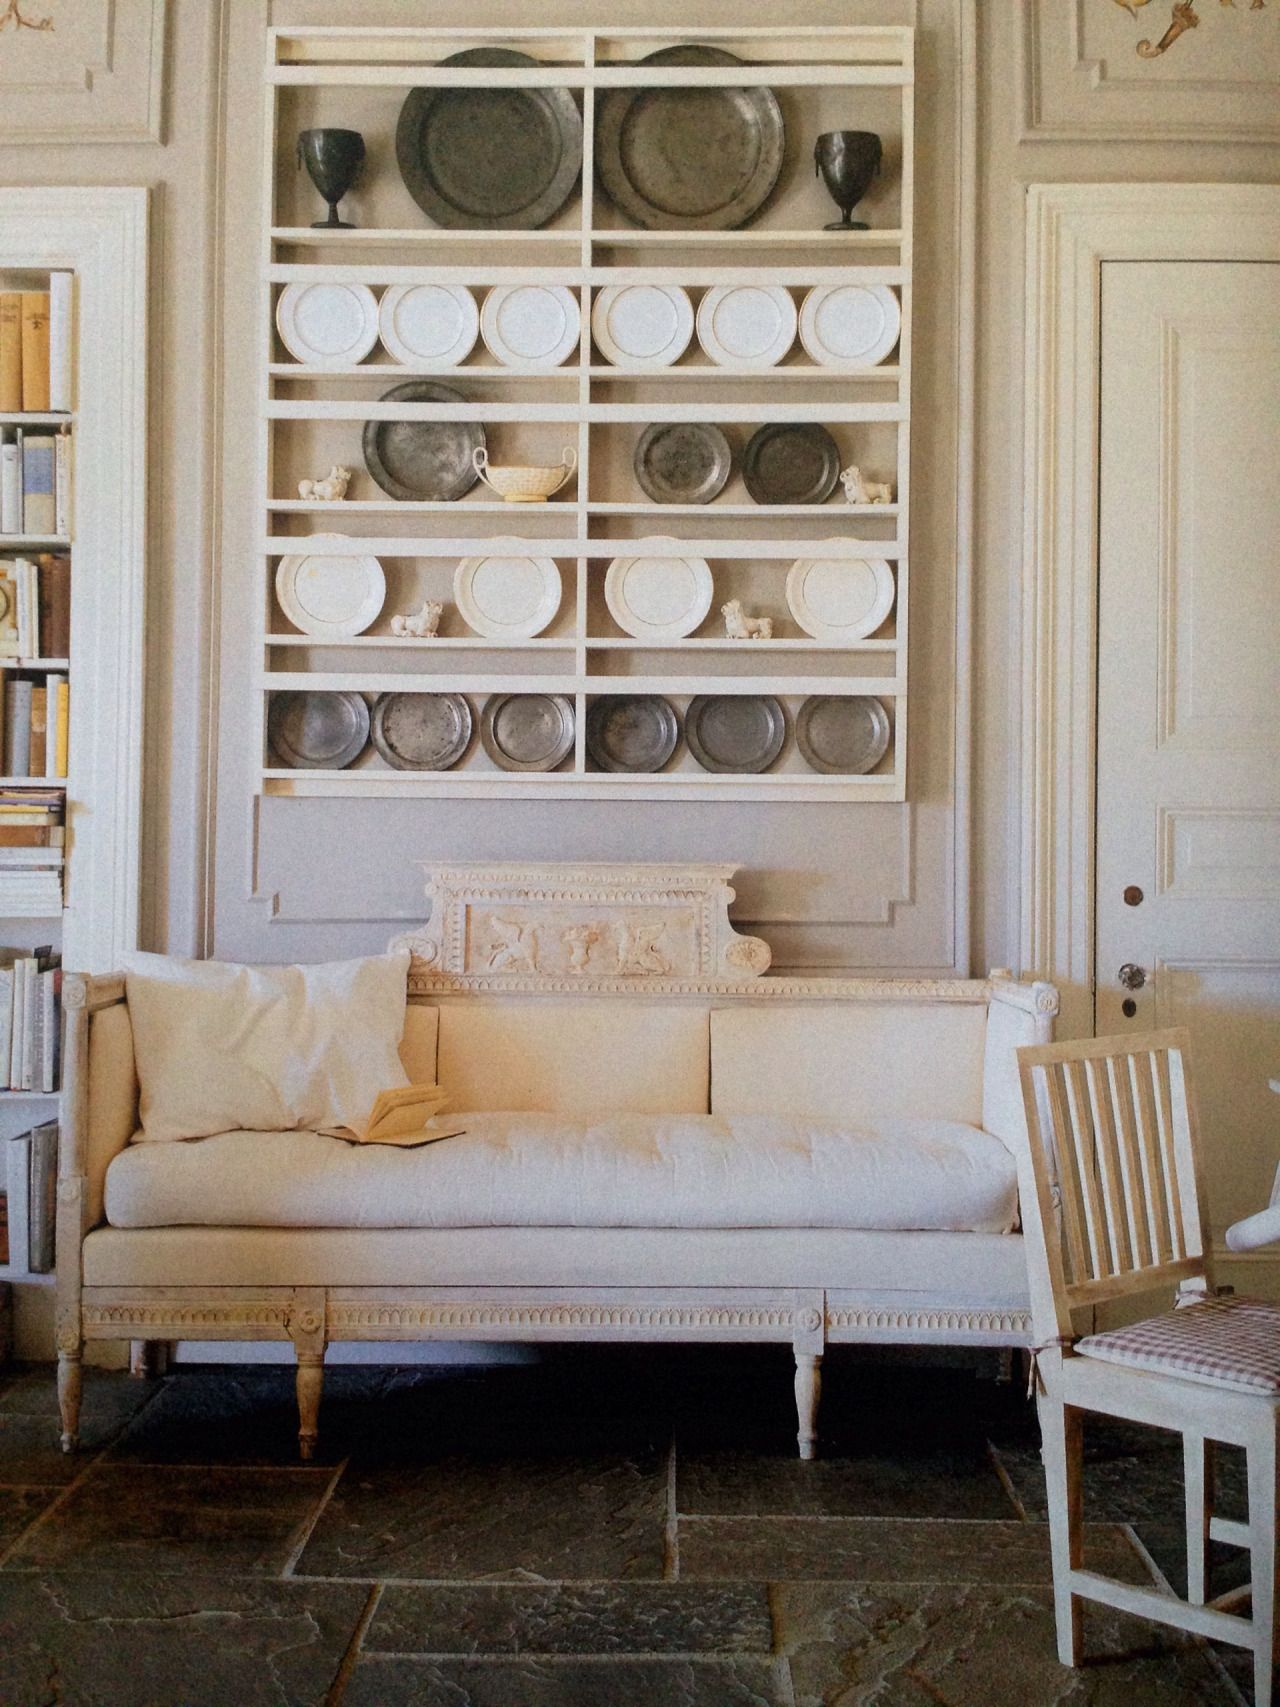 ShabbyChicMonAmour — rickinmar: creamware, pewter, linen and stone. A...